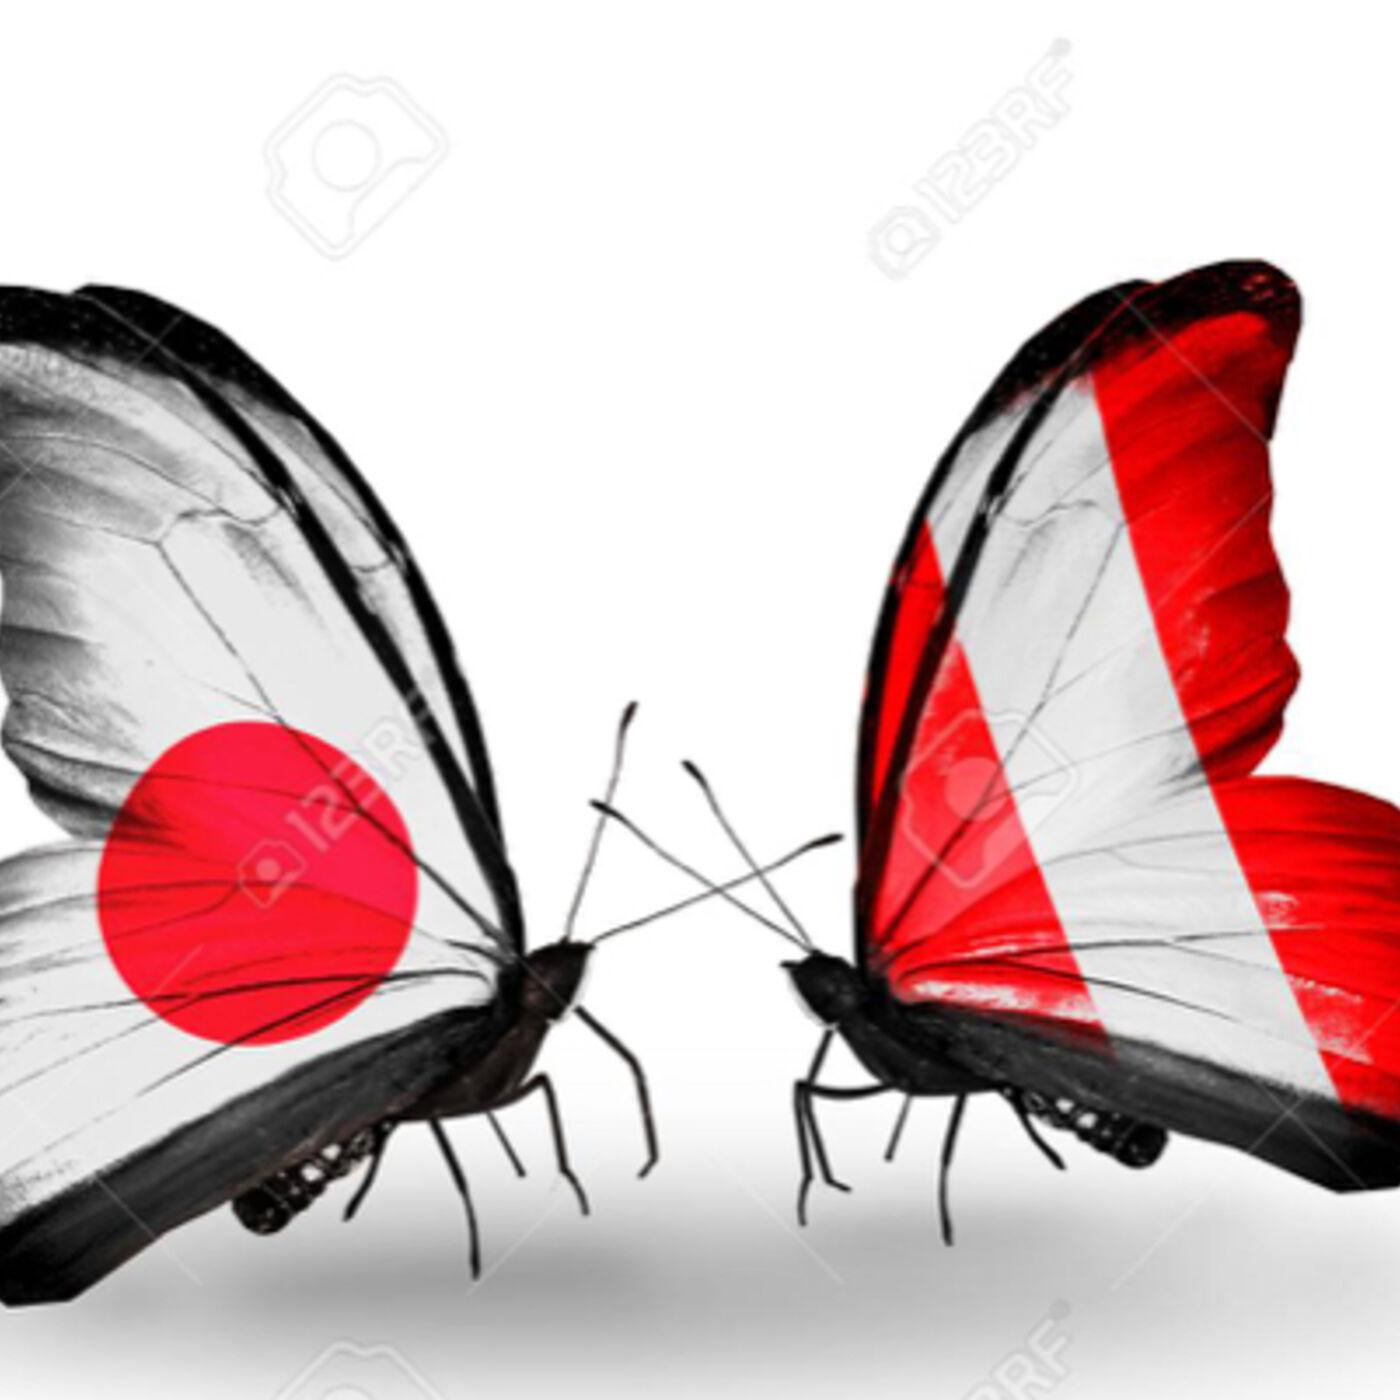 #31 Japanese-Peruvian